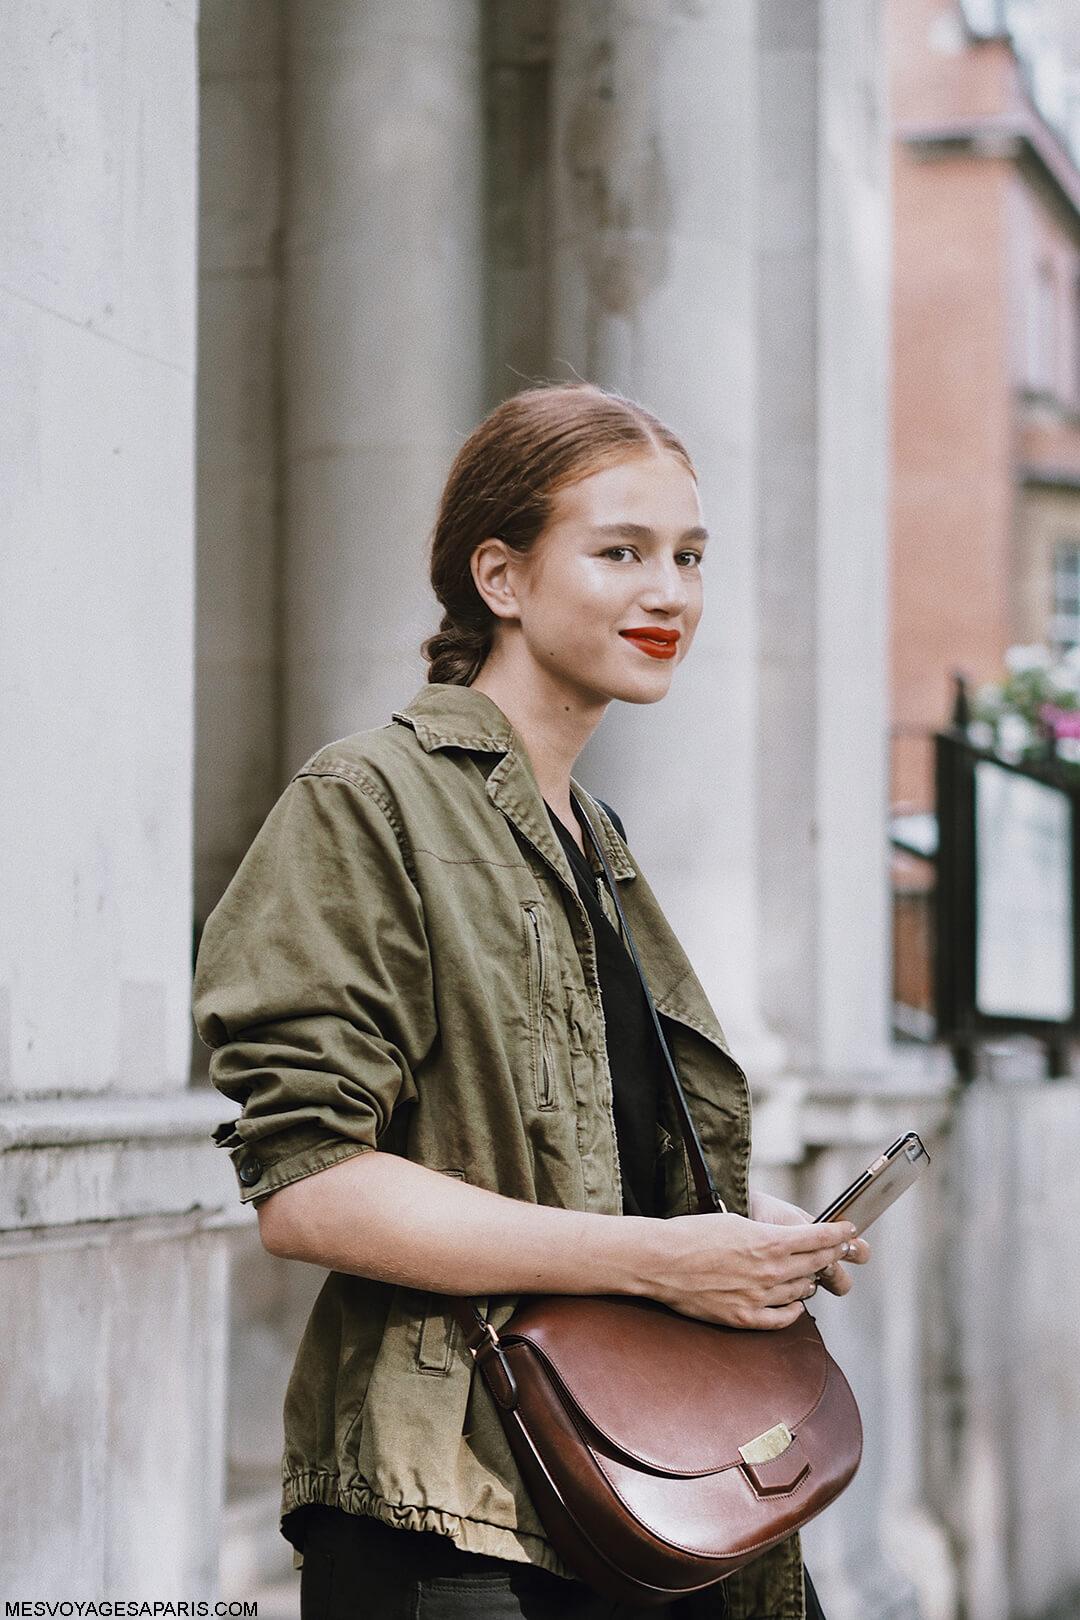 LFW-Street-Style-September-2017-london-fashion-week-2